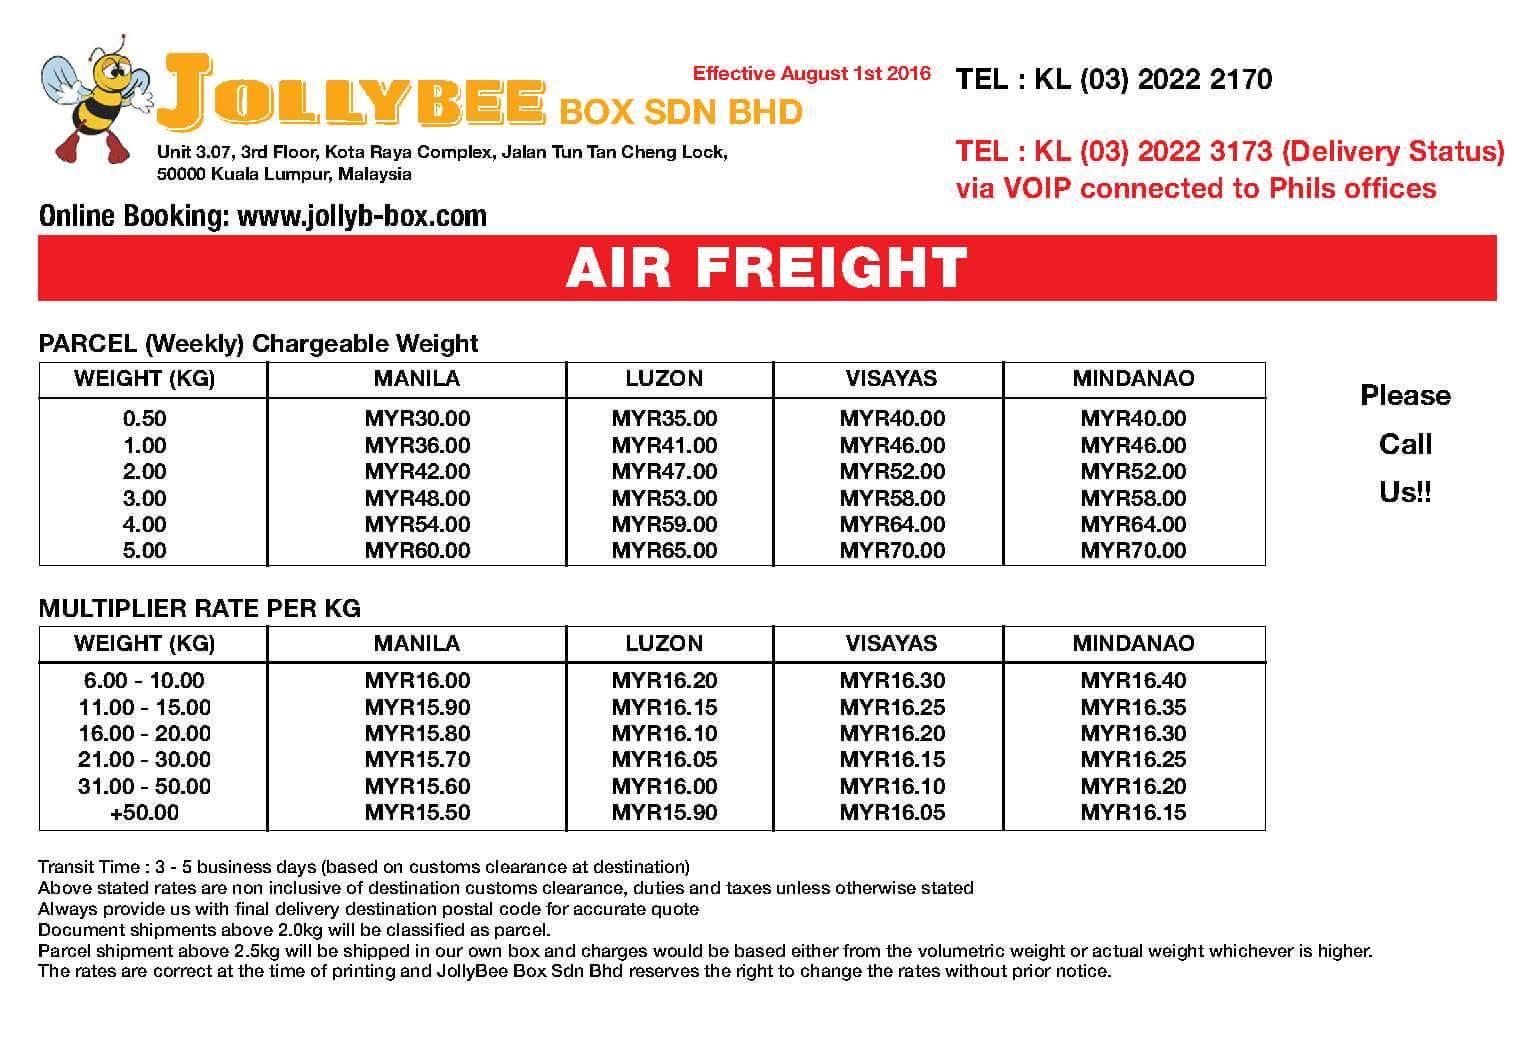 Malaysia Balikbayan Box: JOLLY BEE BOX